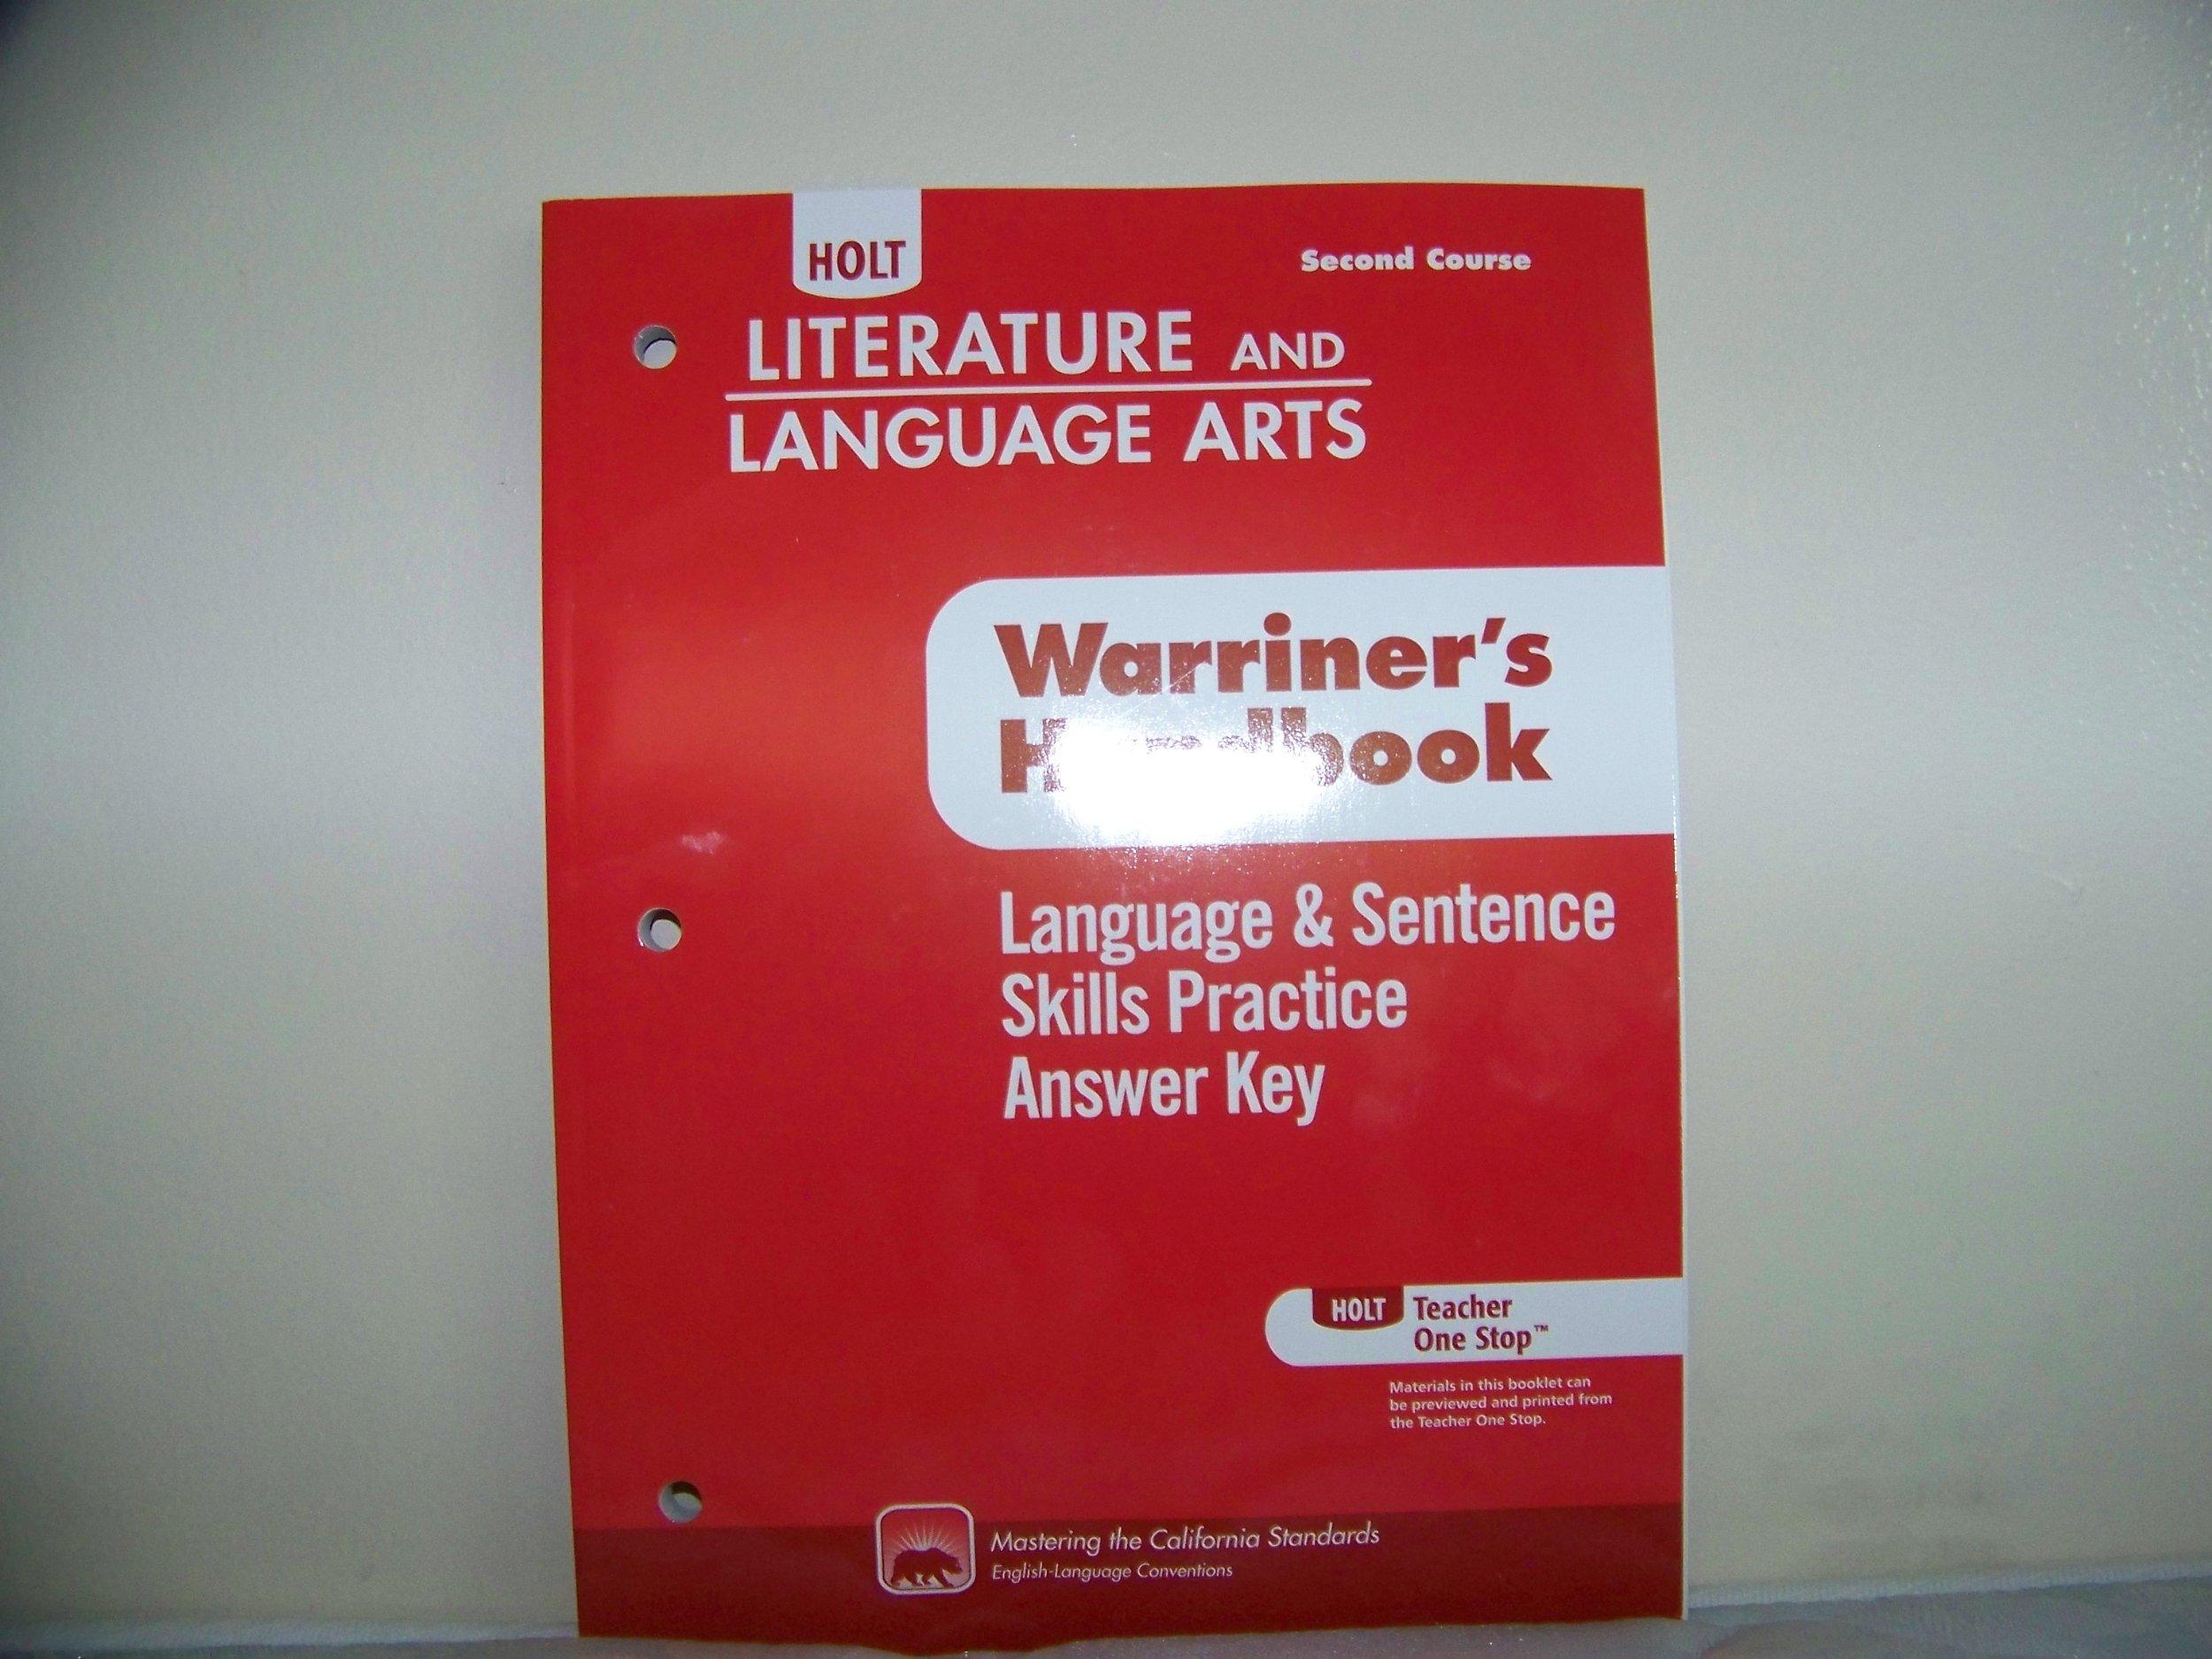 Language Sentence Skills Practice Answer Key Holt Literature And Language Arts Second Course Warriner S Handbook Holt Rinehart And Winston 9780554011196 Amazon Com Books [ 1875 x 2500 Pixel ]